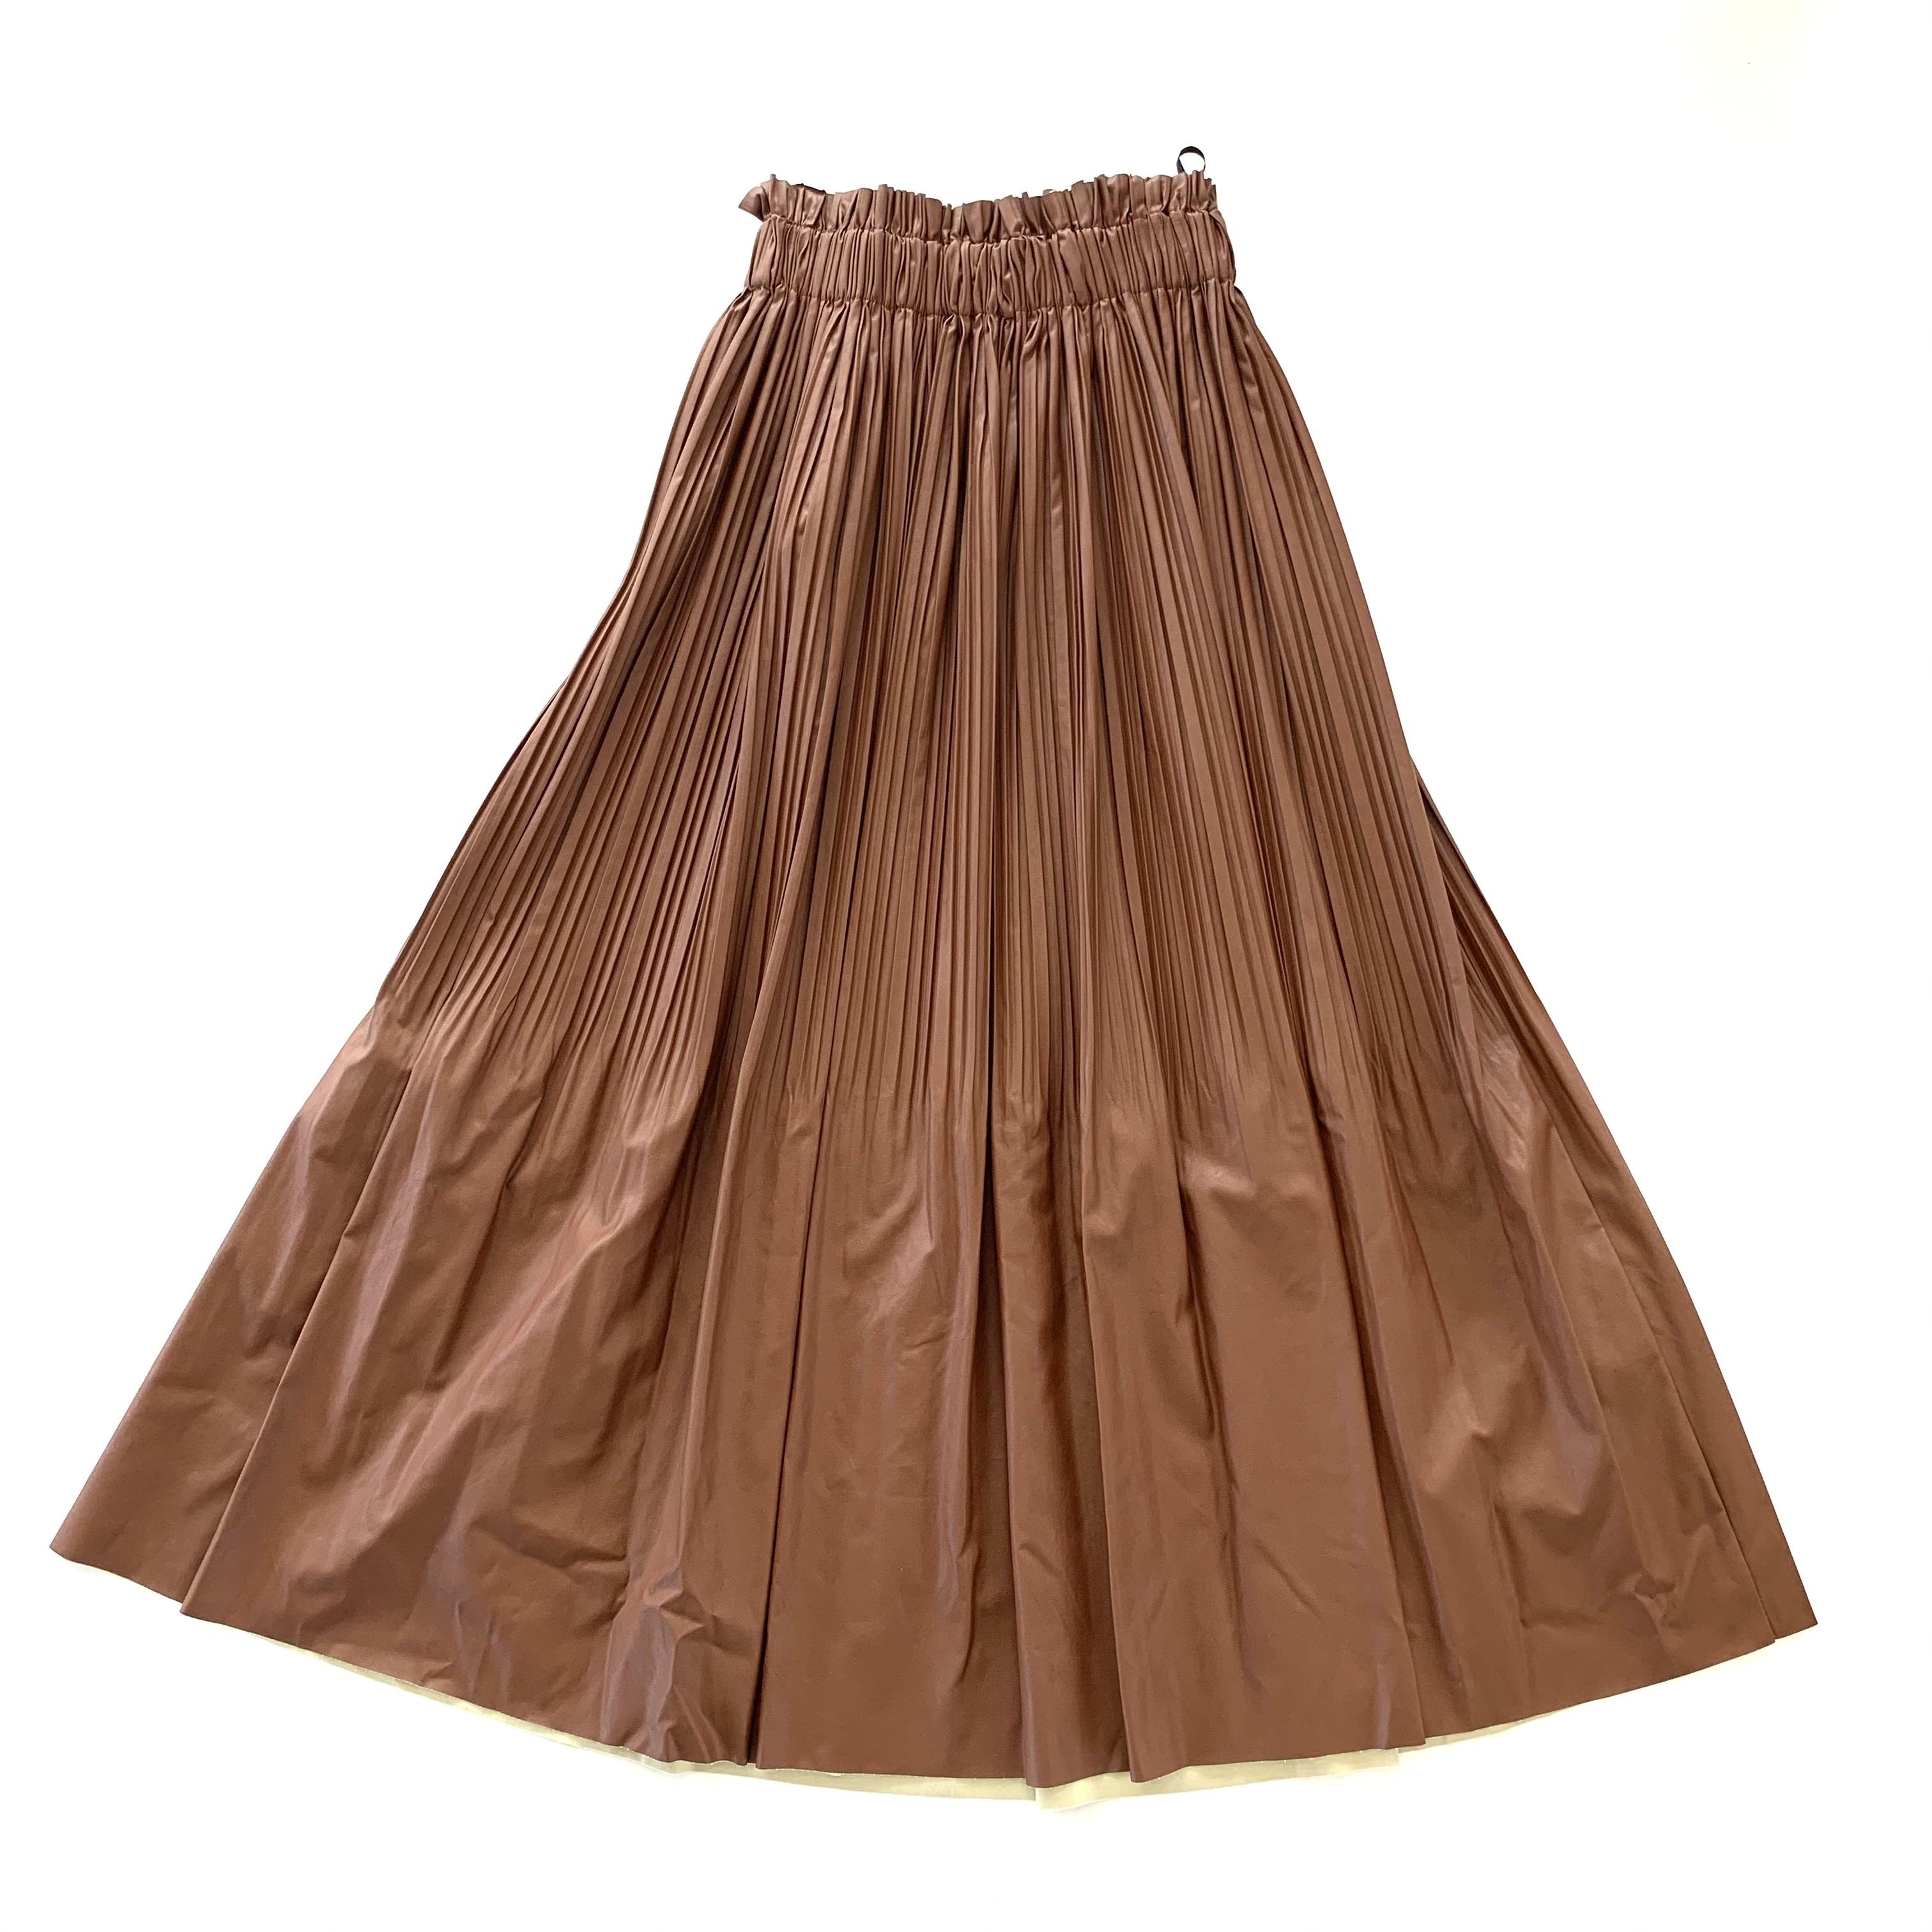 Dignite collier  フェイクレザースカート